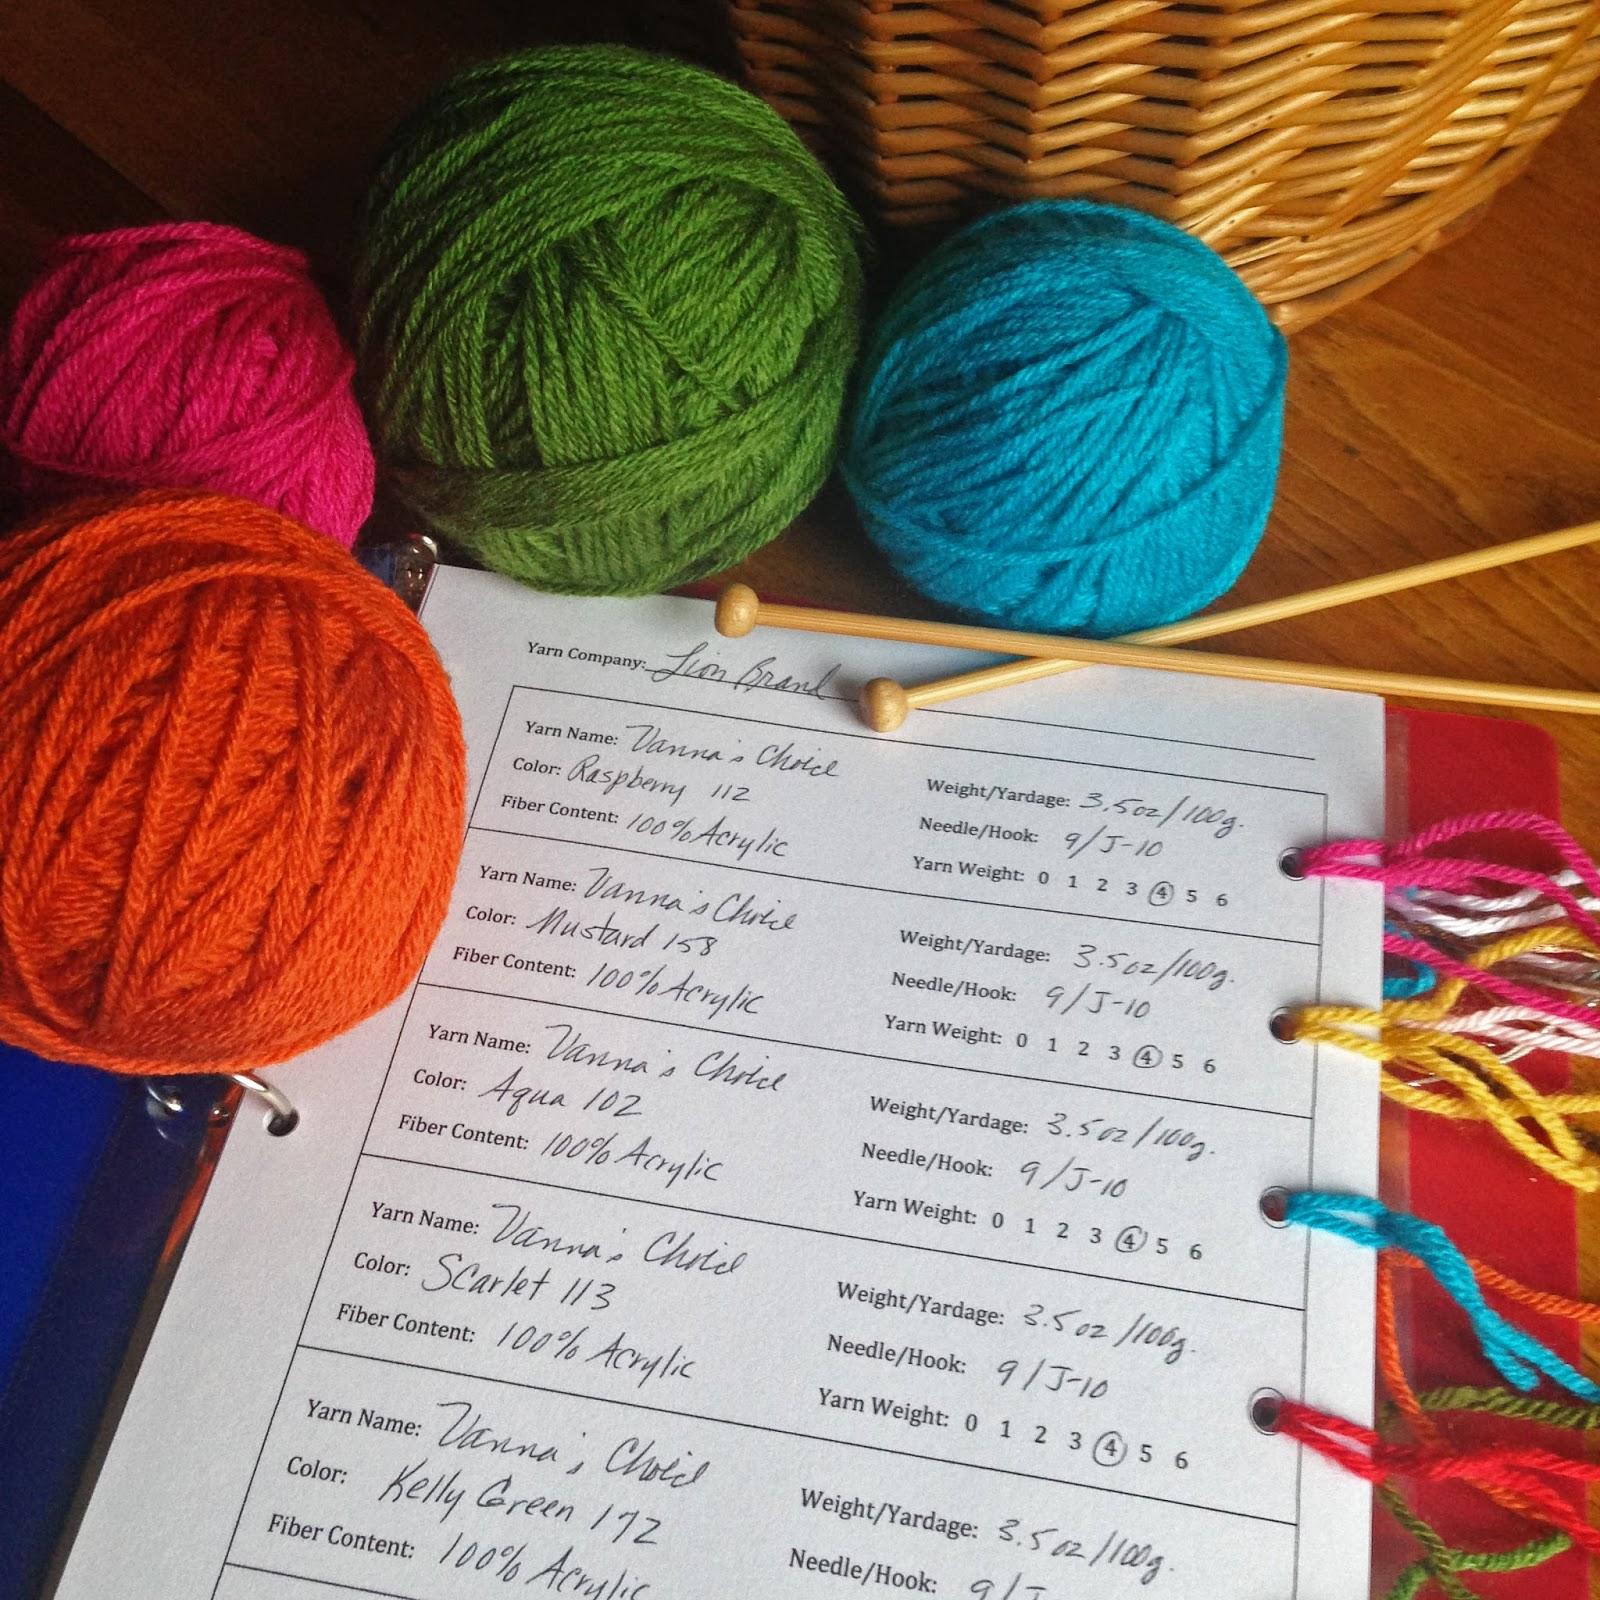 Kbb Crafts Amp Stitches Printable Yarn Organizer Cards